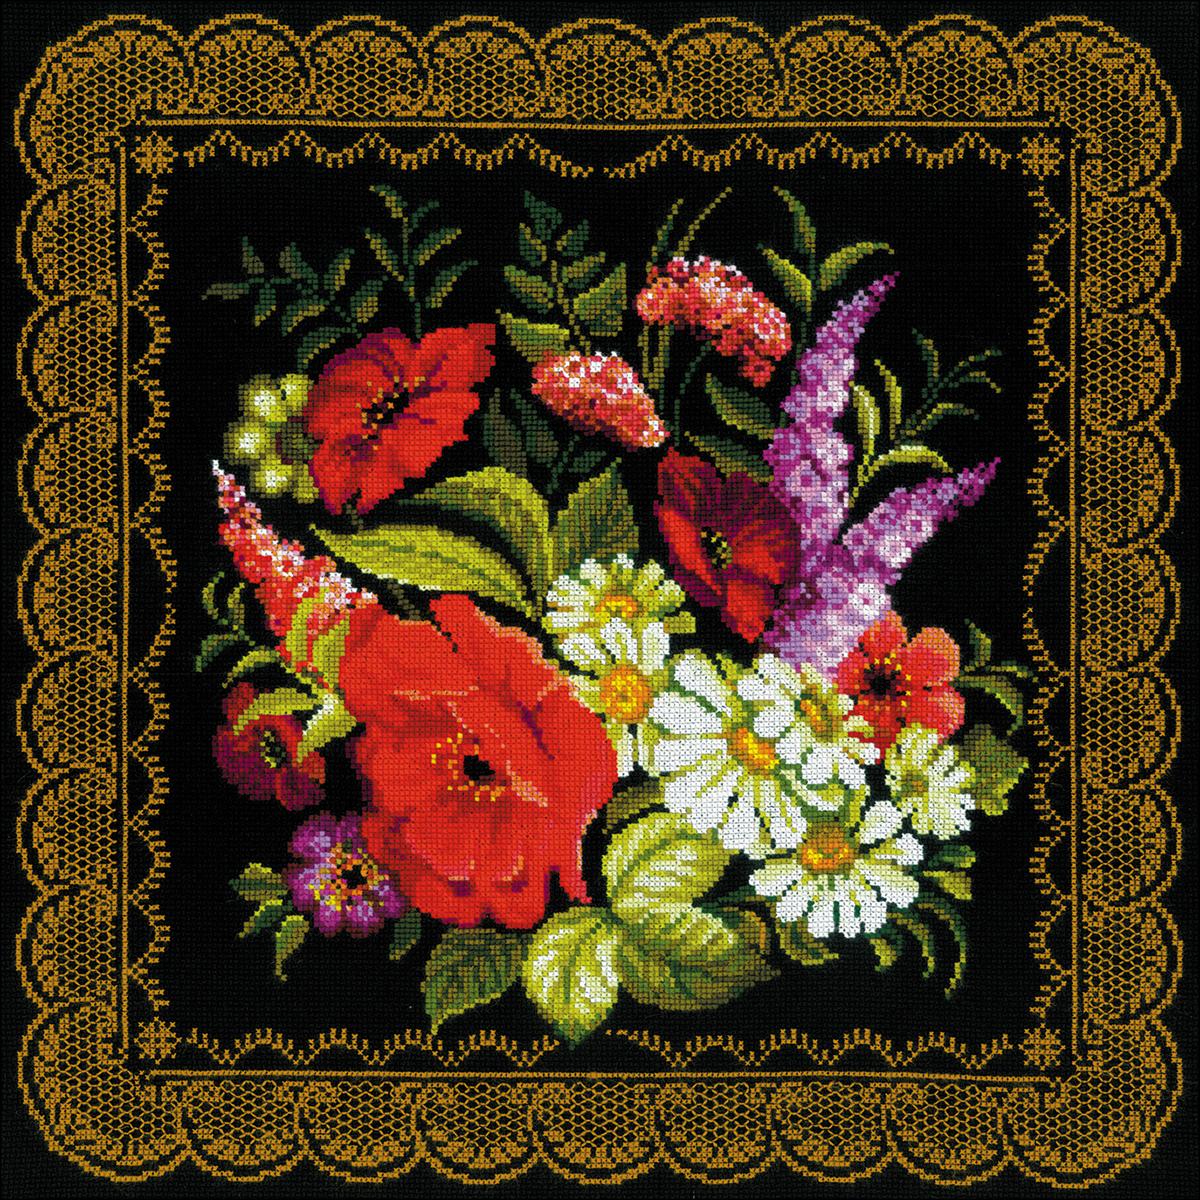 Zhostovo Painting Cushion Counted Cross Stitch Kit -  RIOLIS, R1642